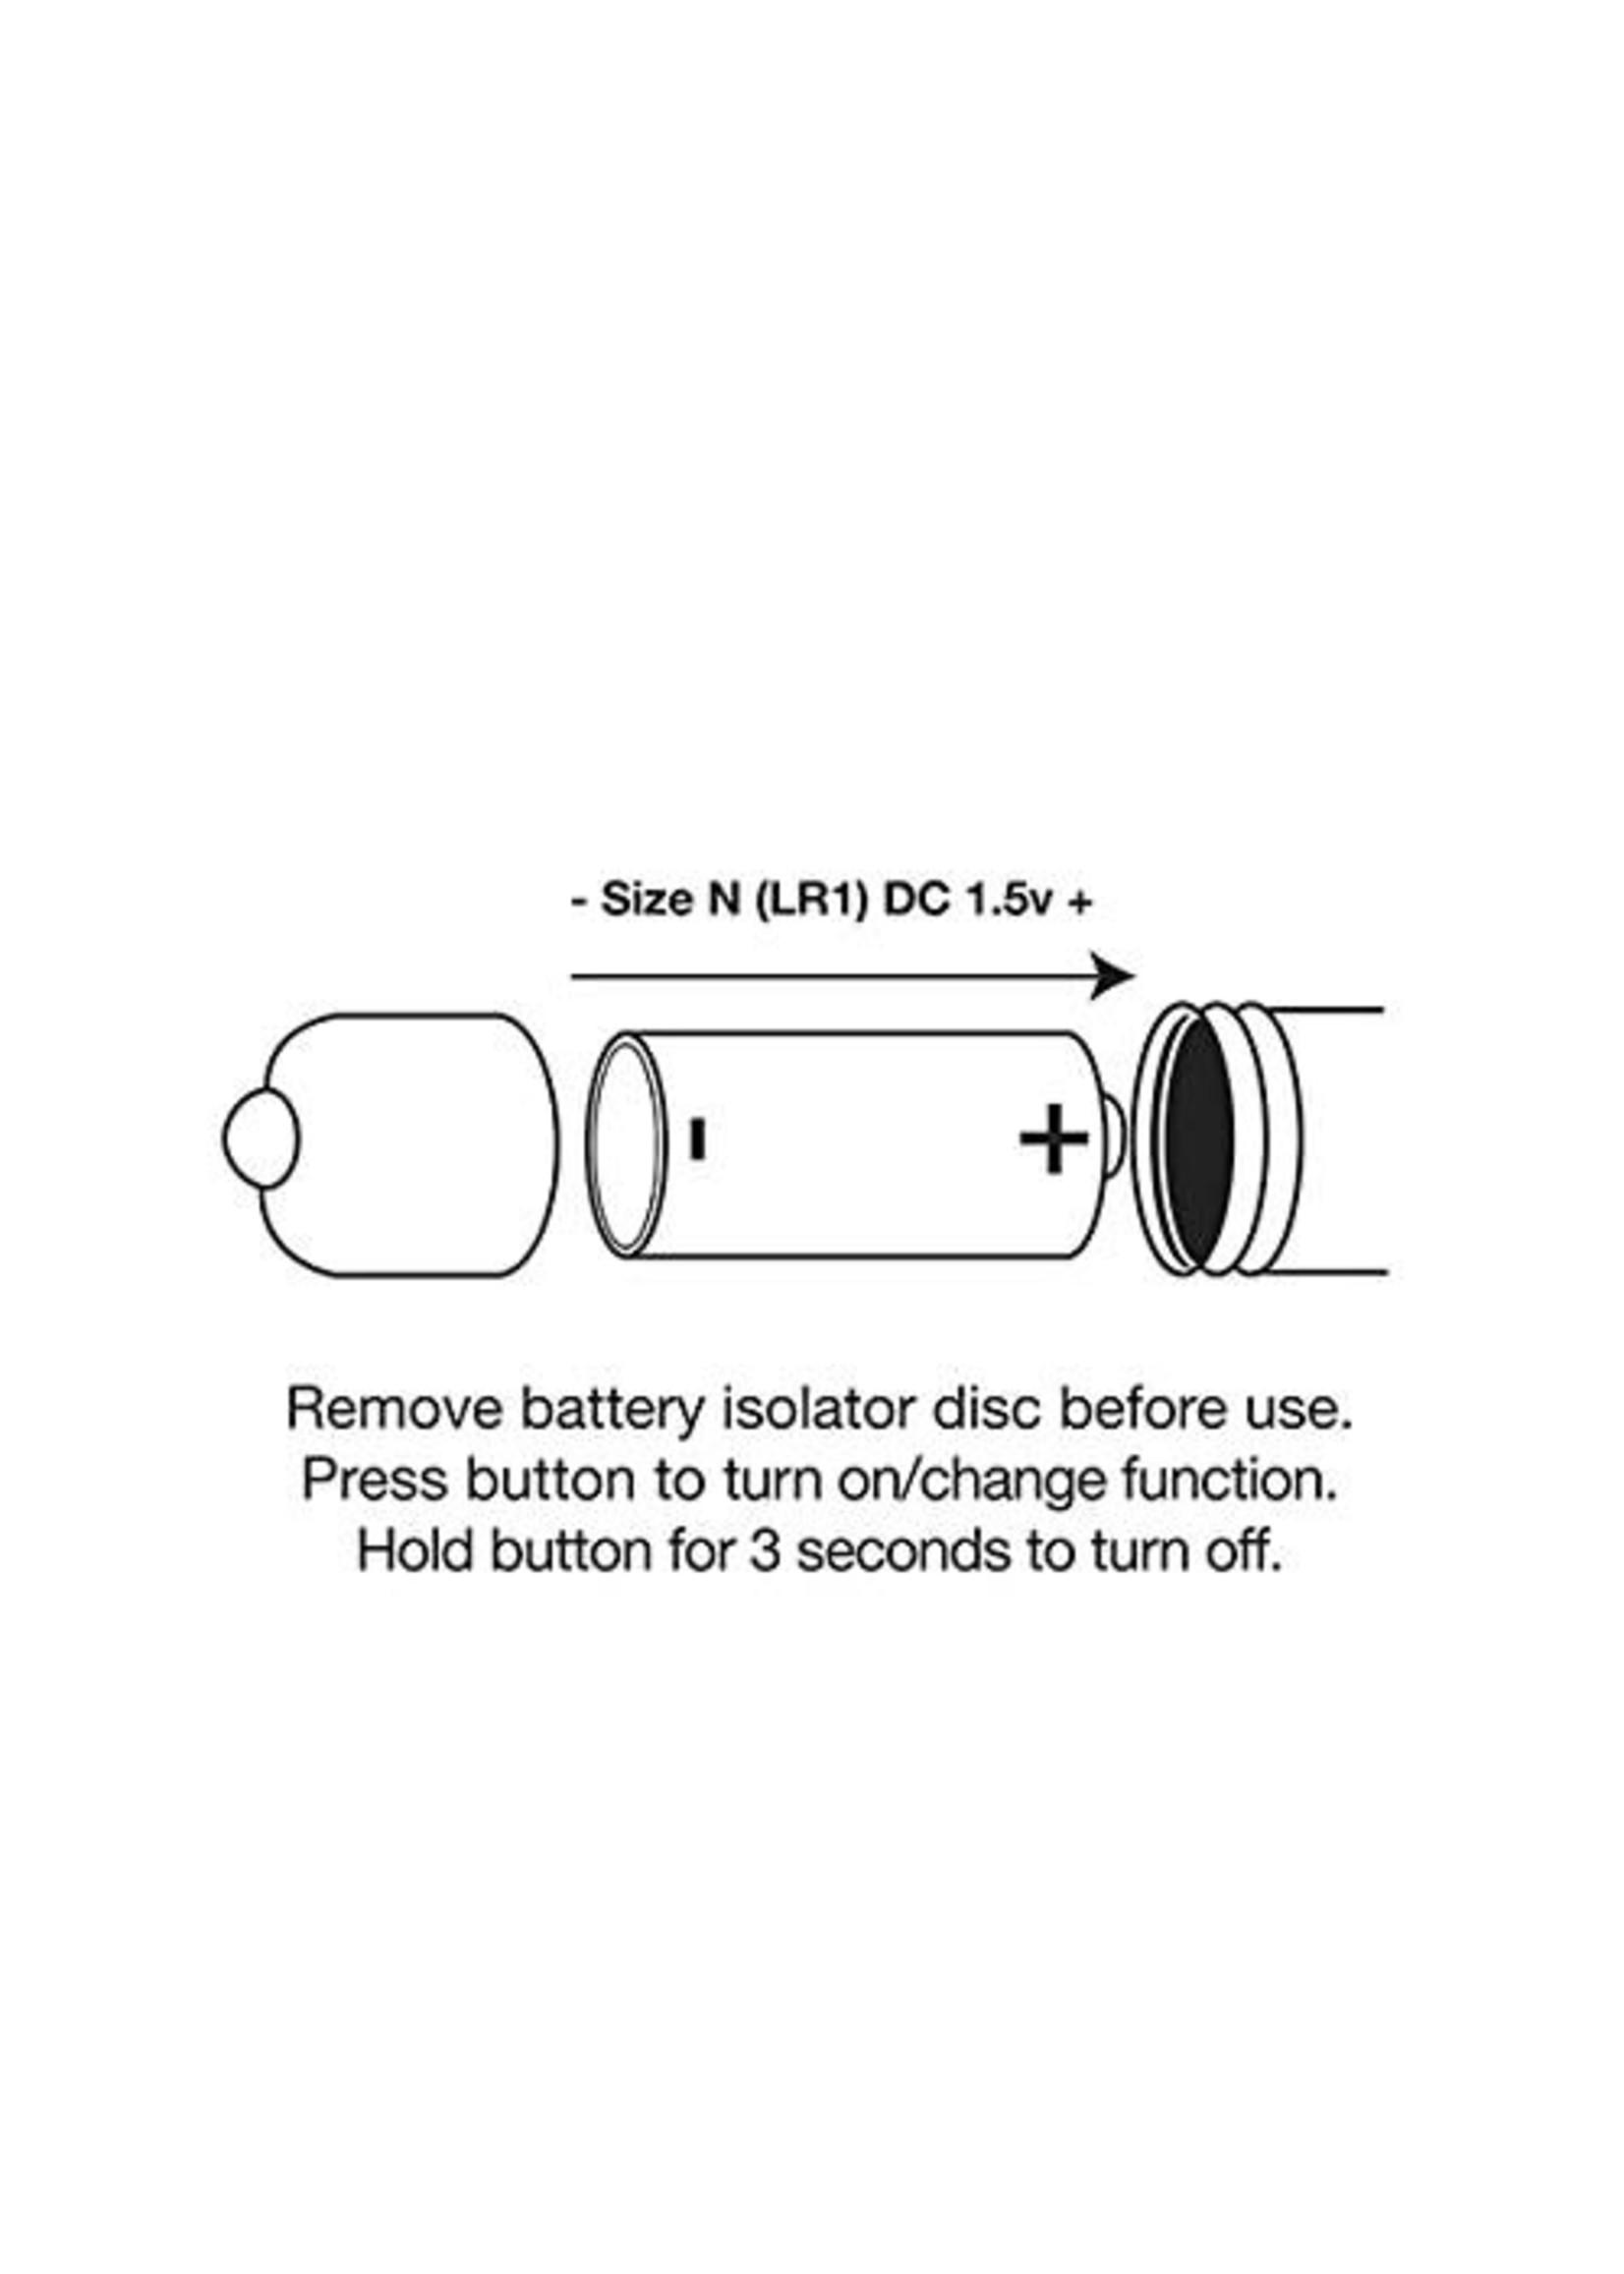 Rocks Off RO-80mm 7 Speed Rainbow Bullet Vibe